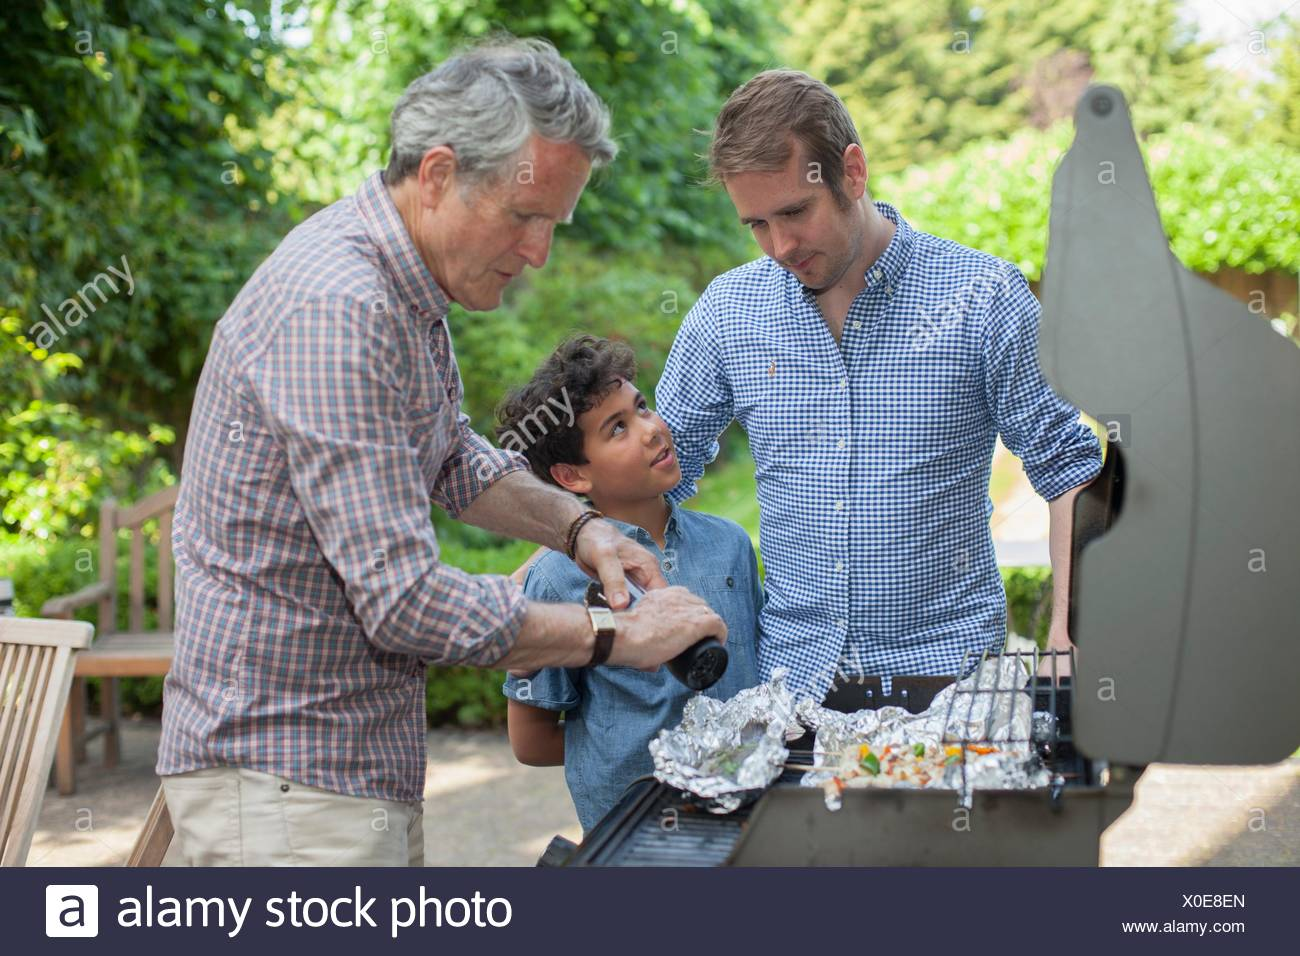 Drei-Generationen-Familie kochen am Grill Stockbild